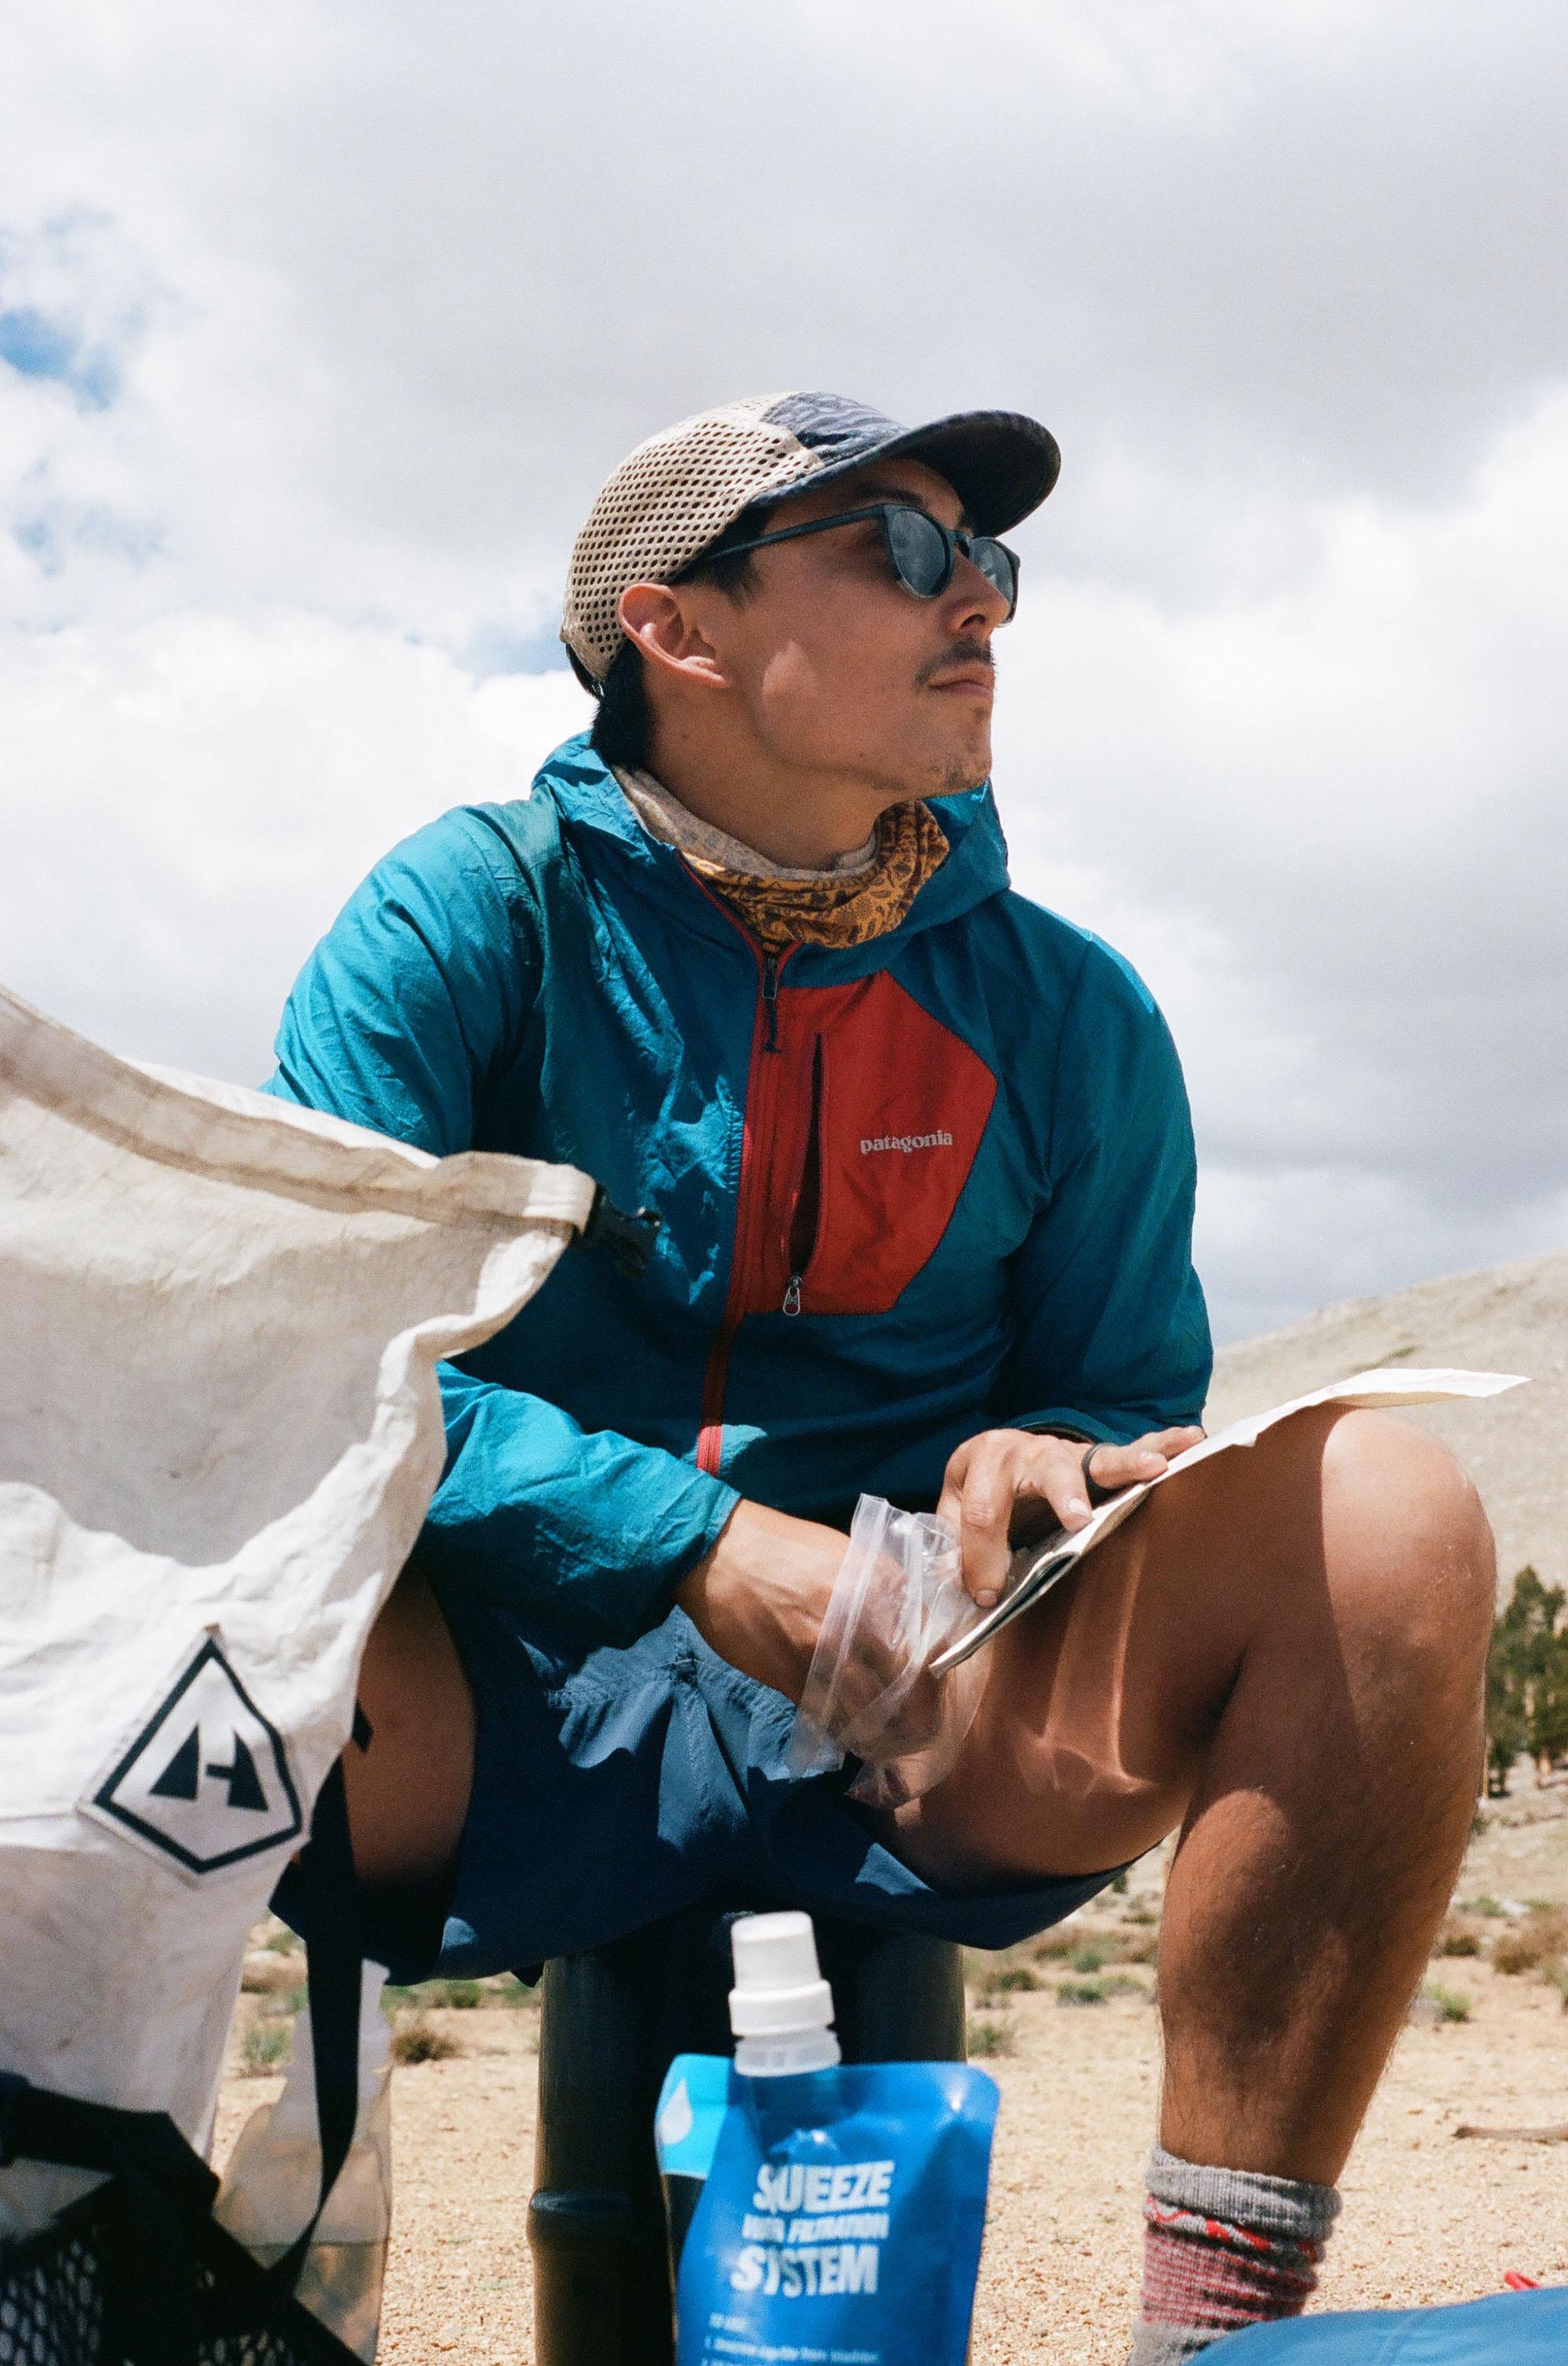 Trail running hat, buff and Stance Socks, 35mm film